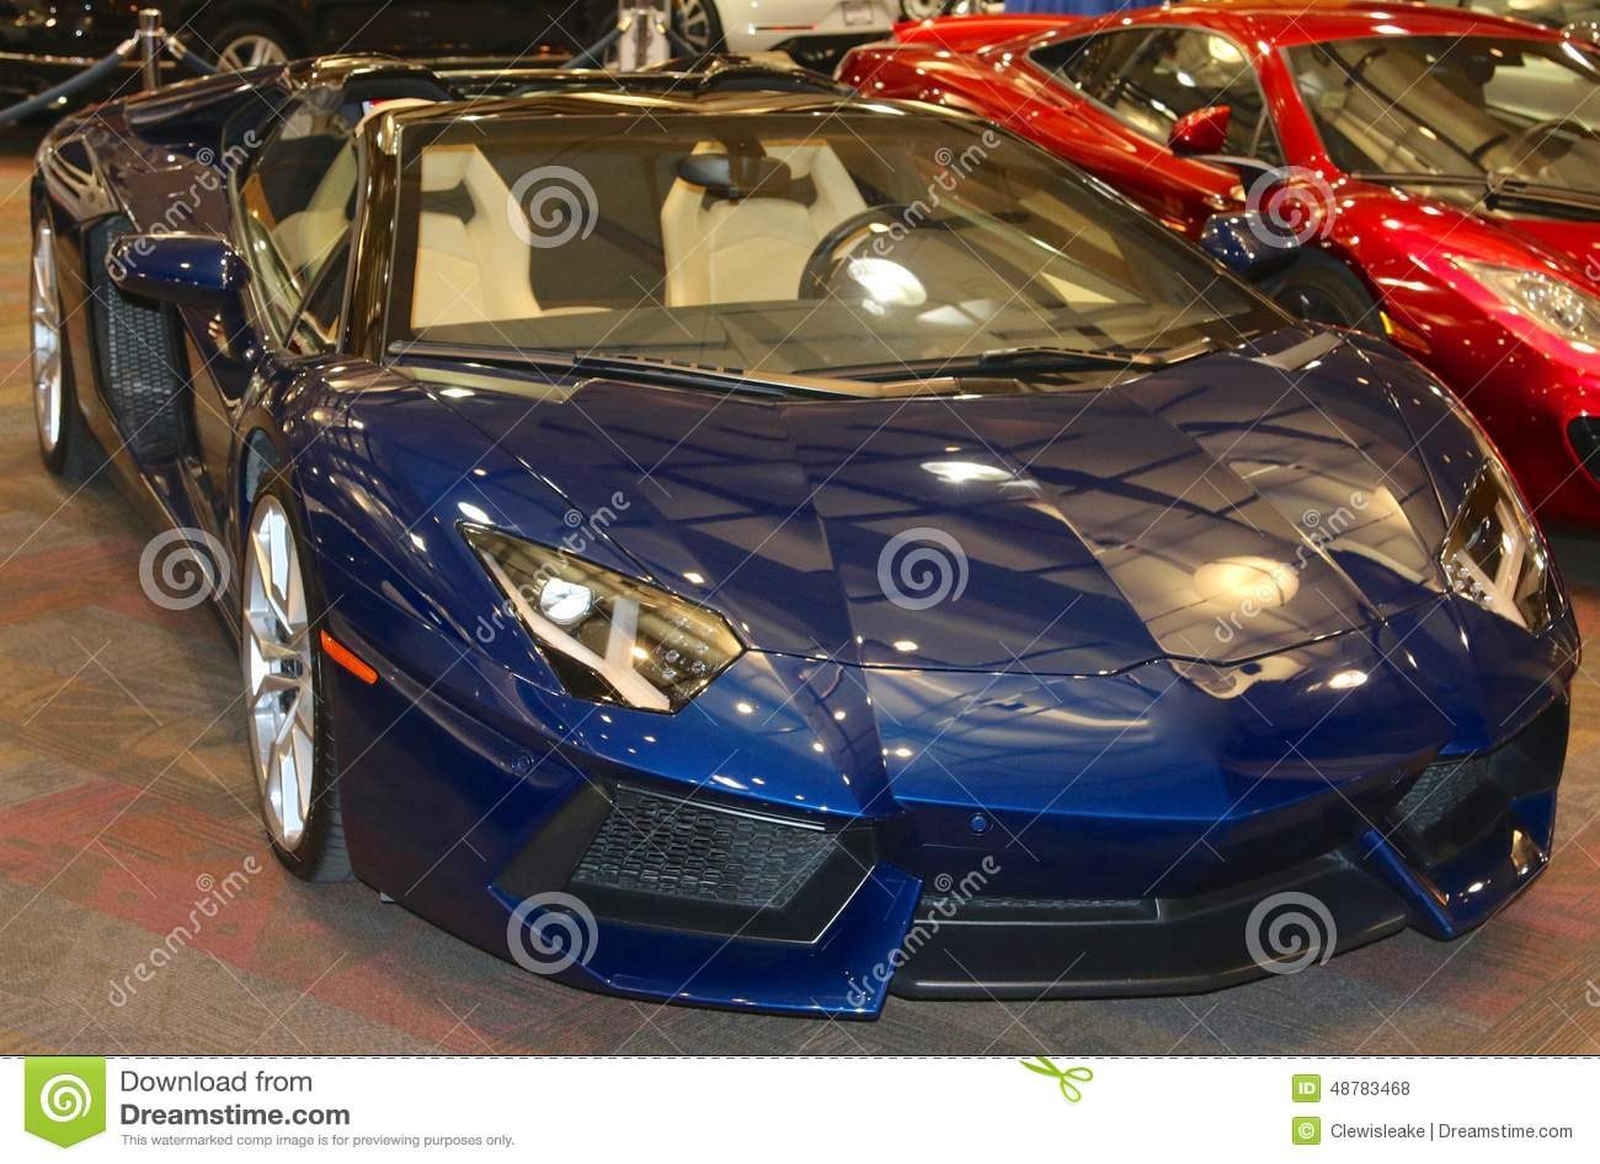 Lamborghini In Dazzling Midnight Blue Editorial Stock Photo Image Of Dazzling International 48783468